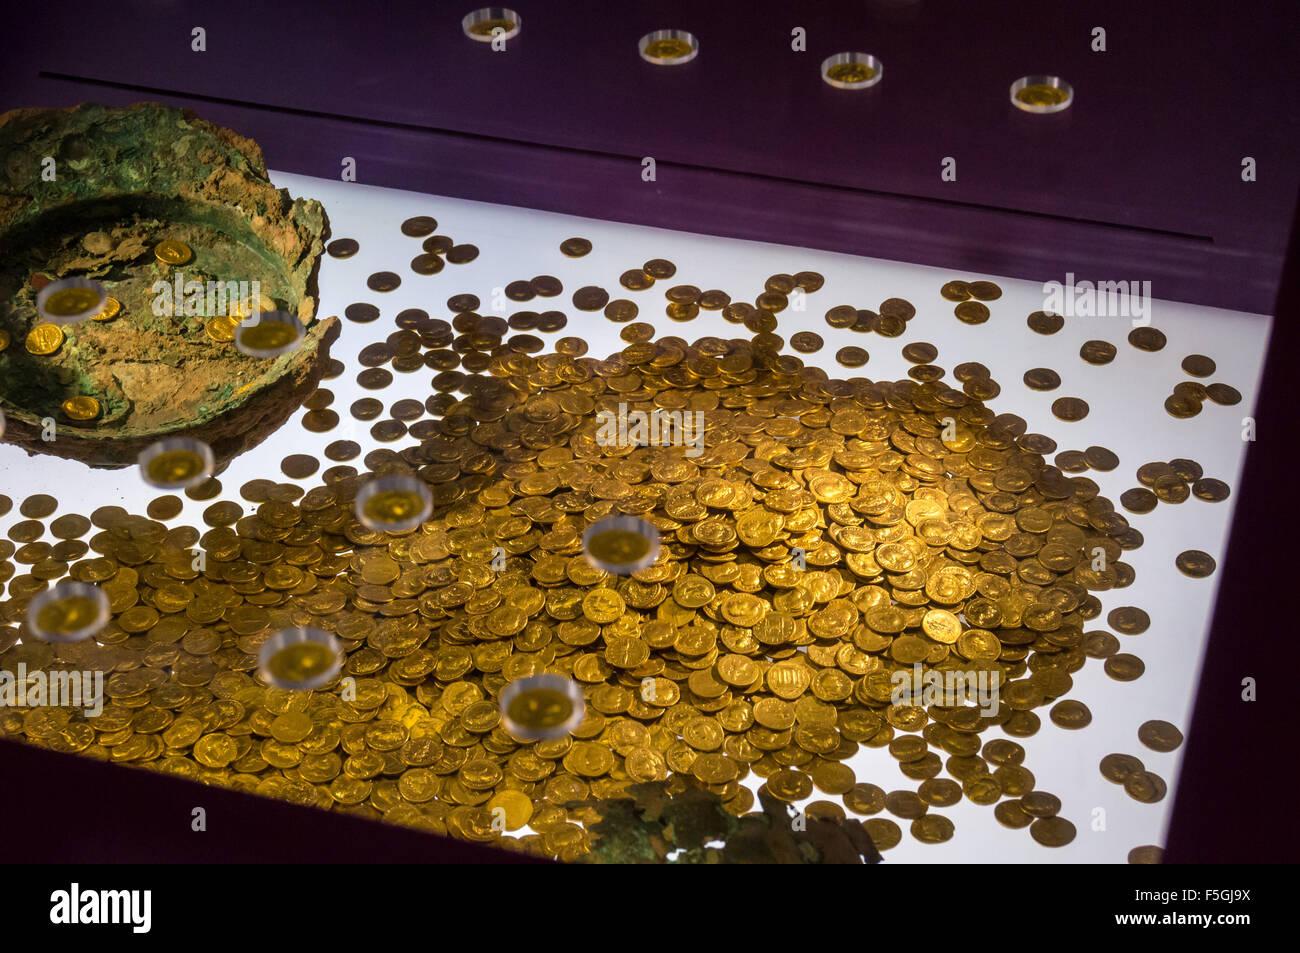 roman-coin-hoard-of-gold-aurei-landesmuseum-state-museum-trier-rheinland-F5GJ9X.jpg